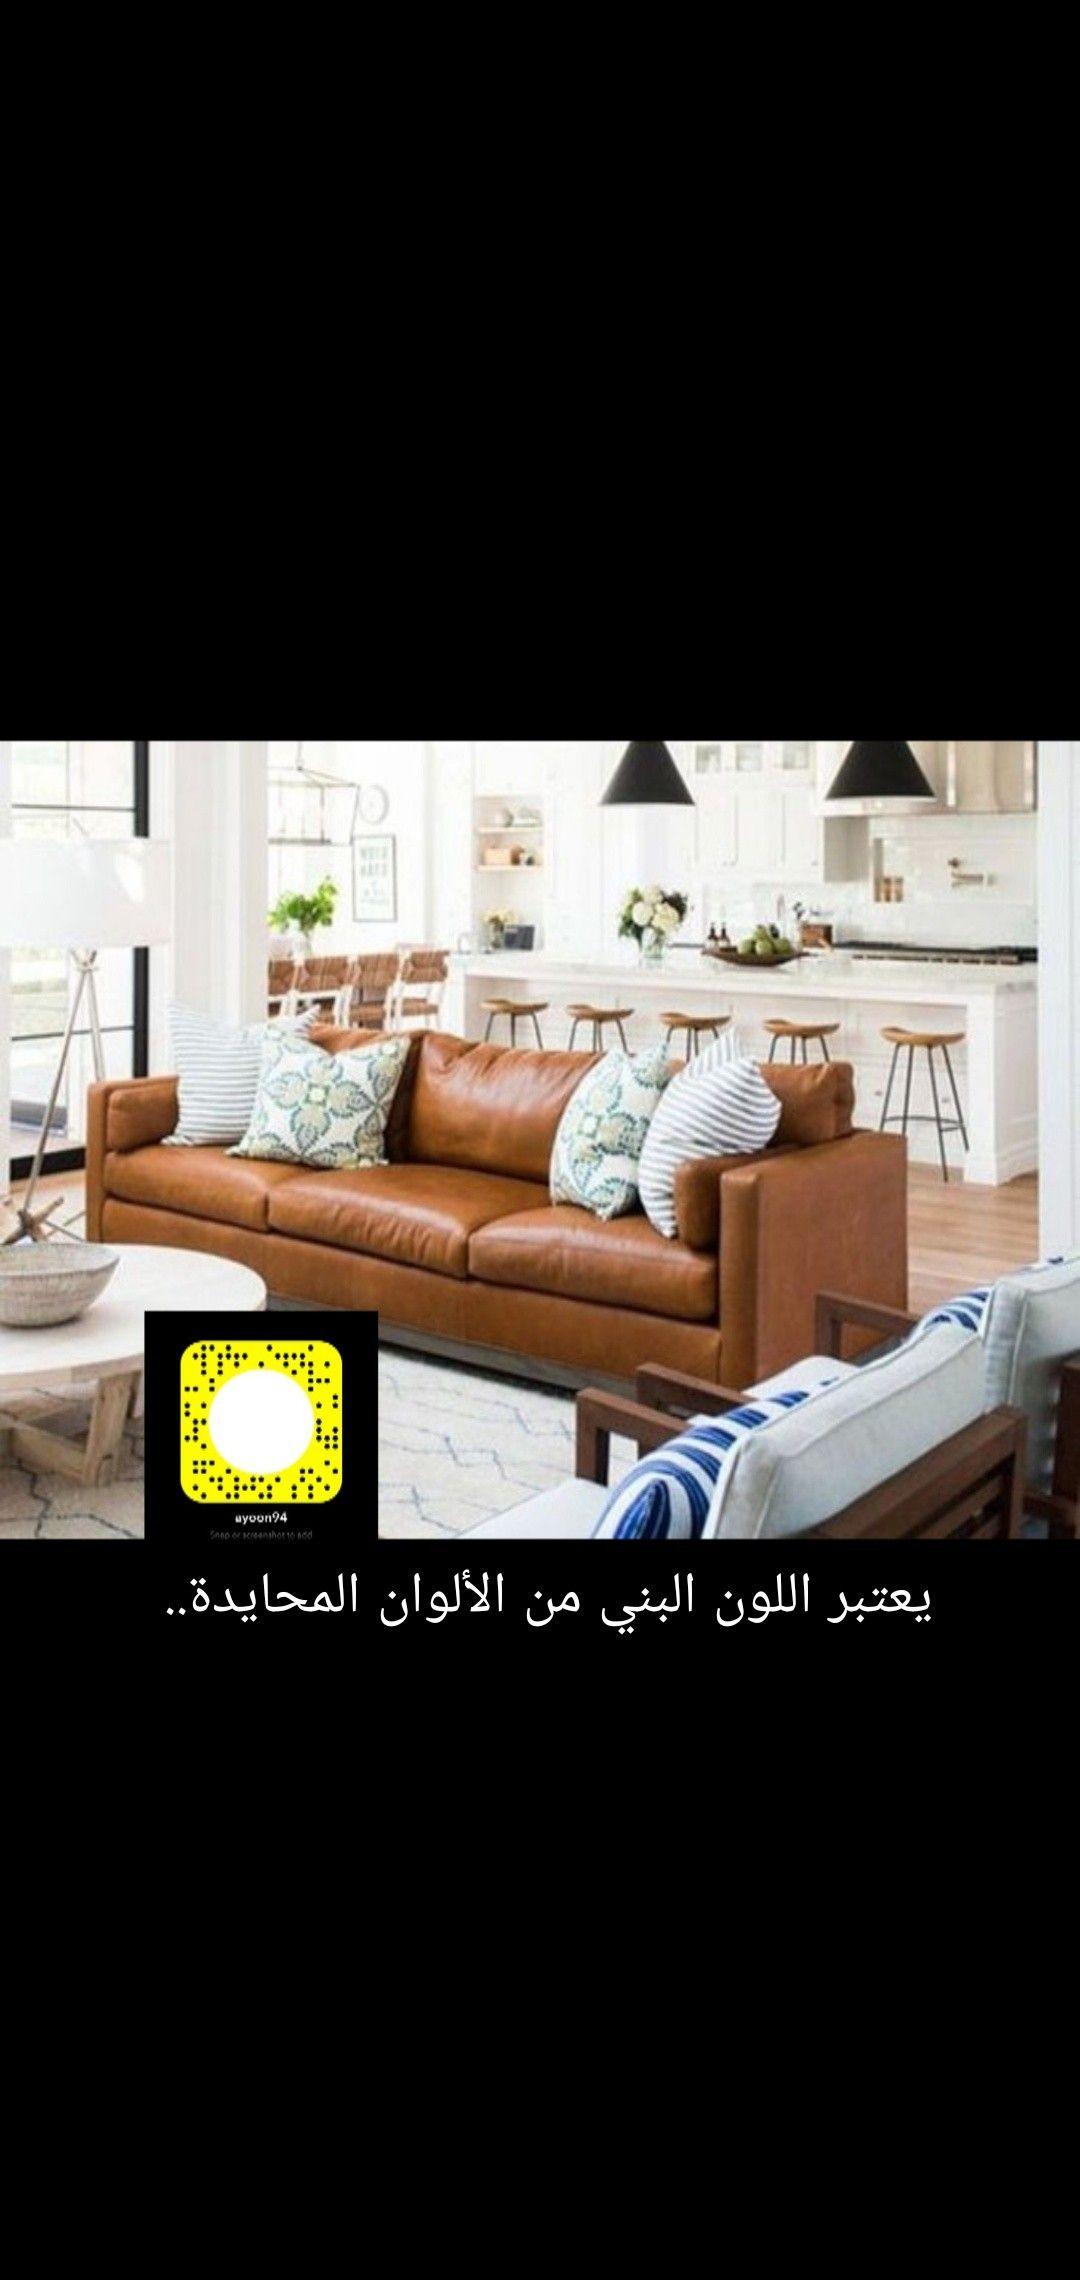 Color ألوان Home Decor Outdoor Decor Furniture